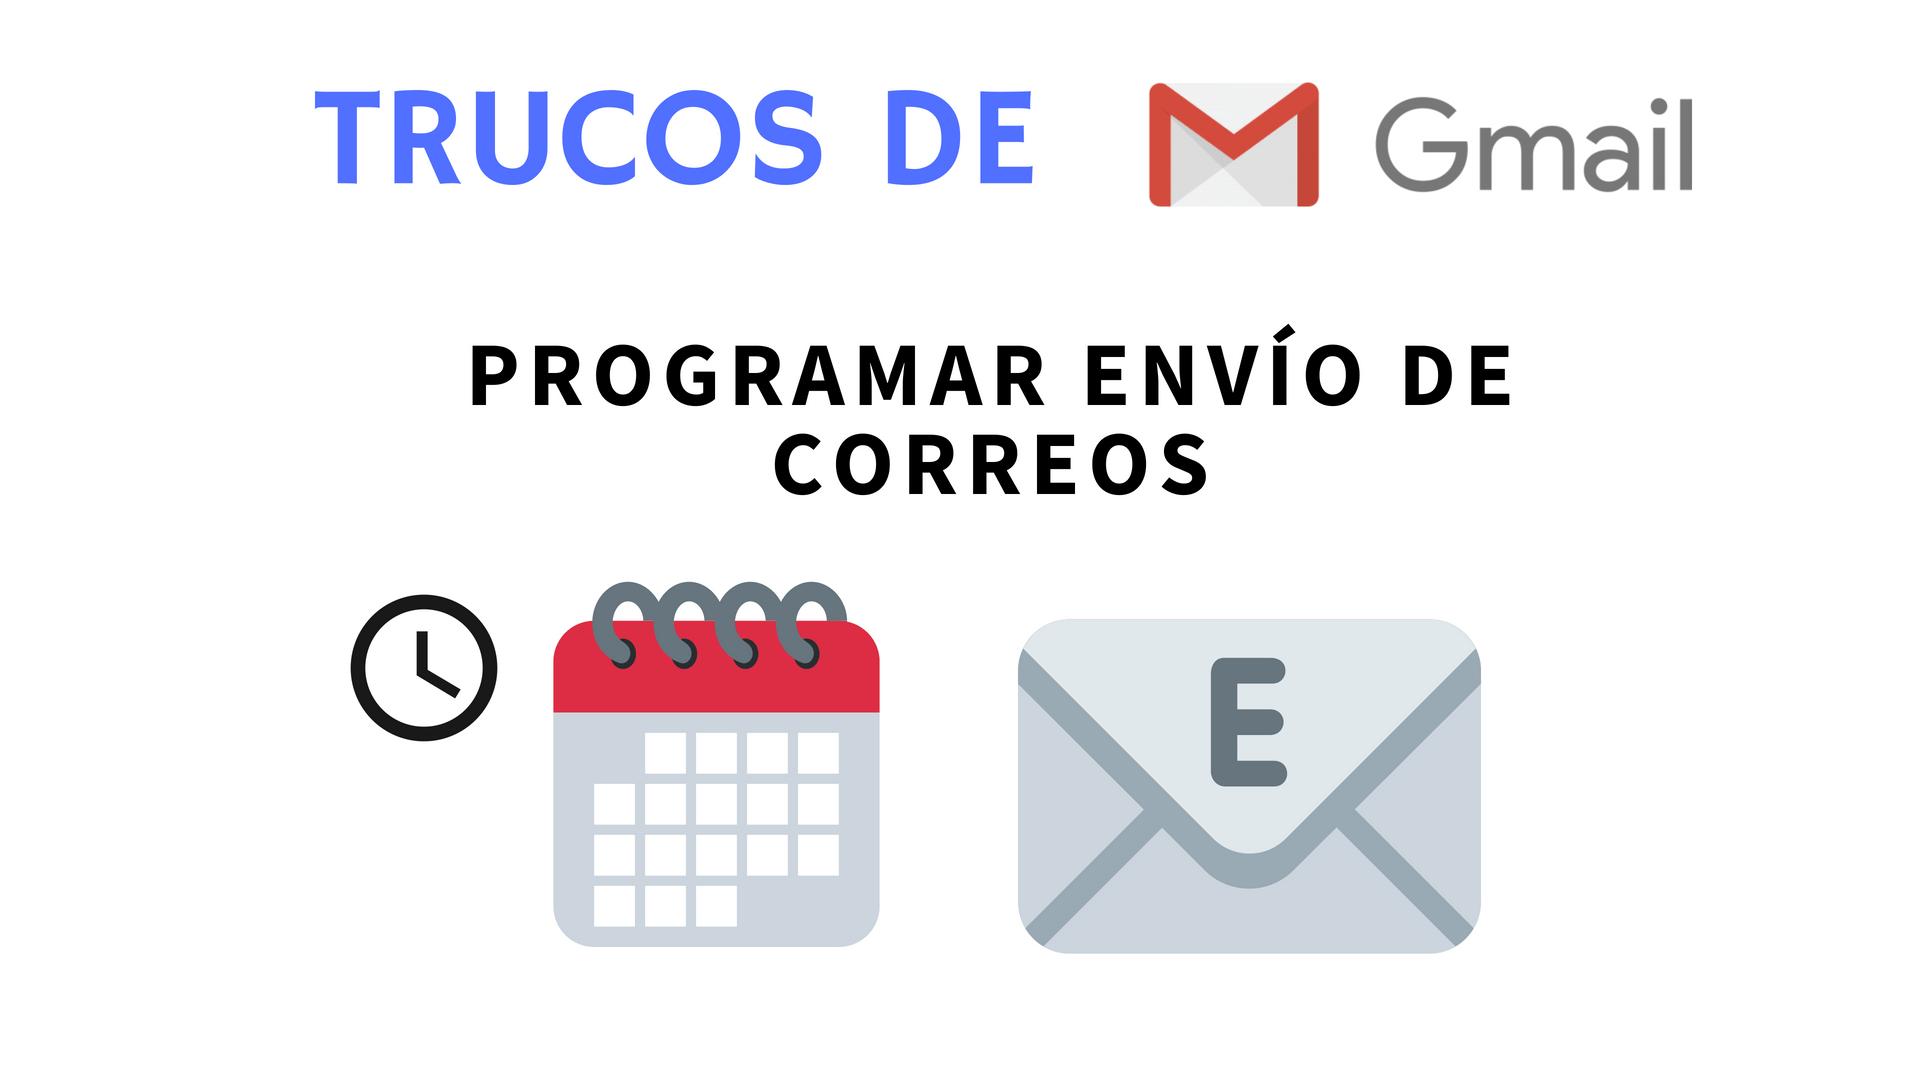 Programar envío de correos en Gmail